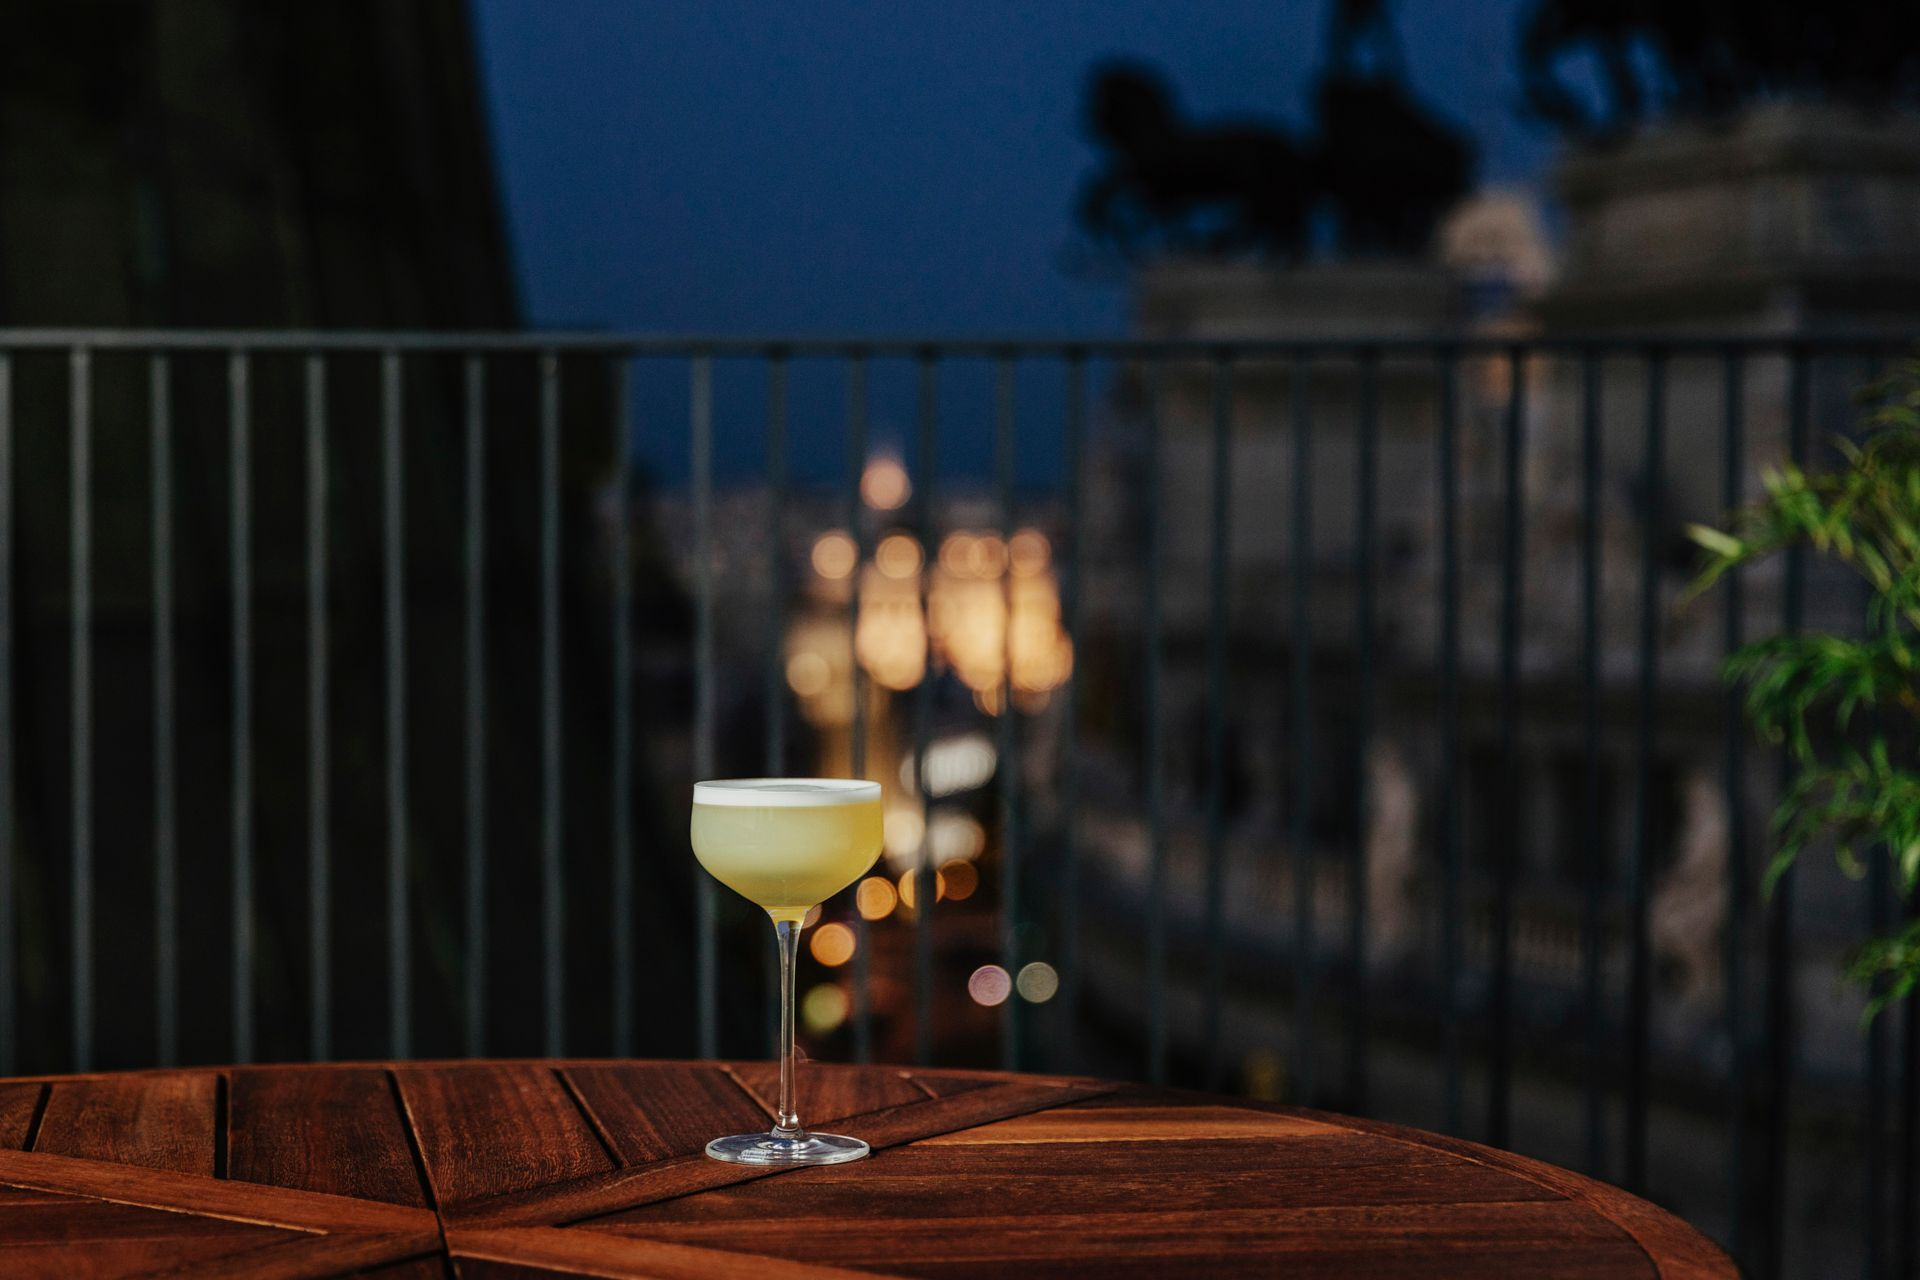 Cóctel en la terraza / Foto: Óscar Romero